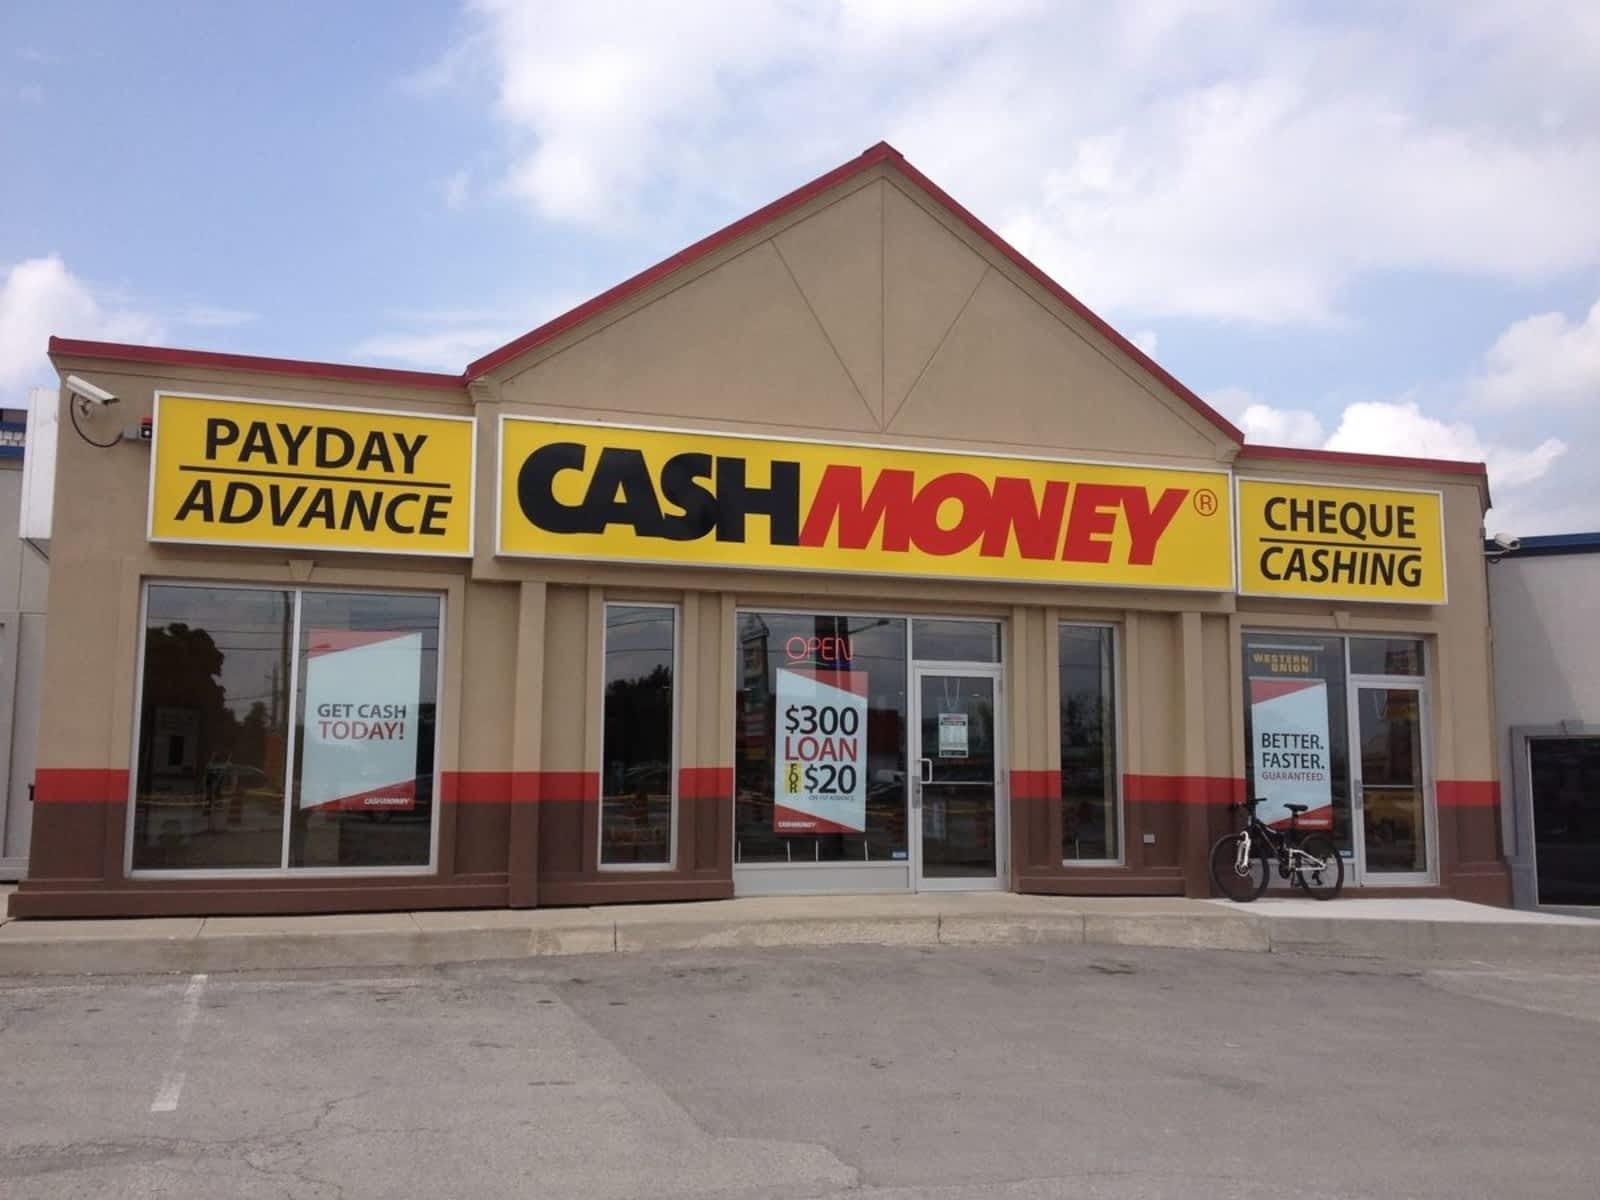 Cash rush loans photo 2